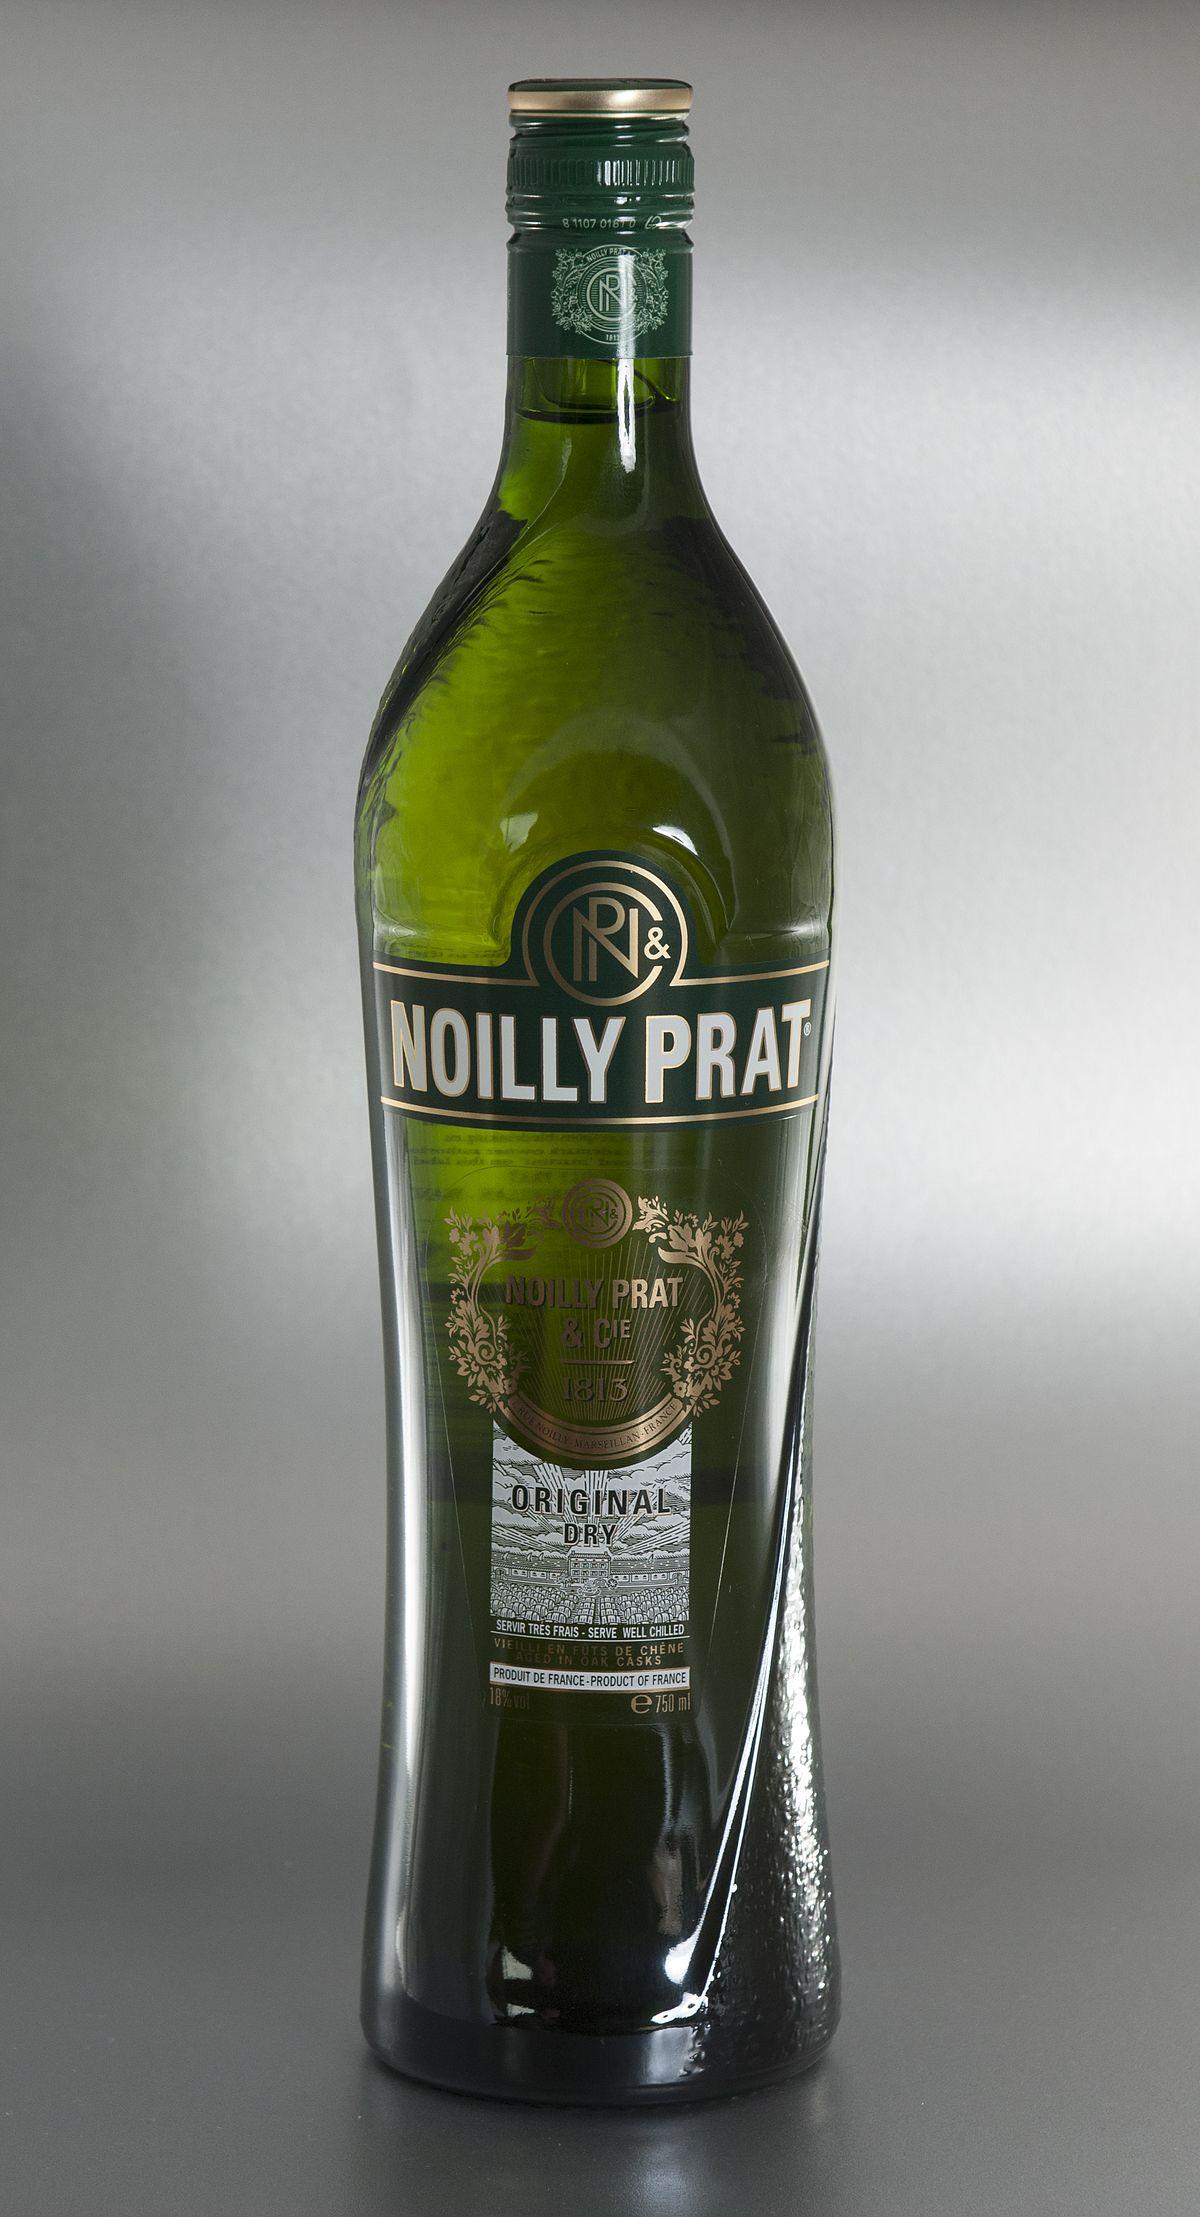 Noilly Prat – Wikipedia